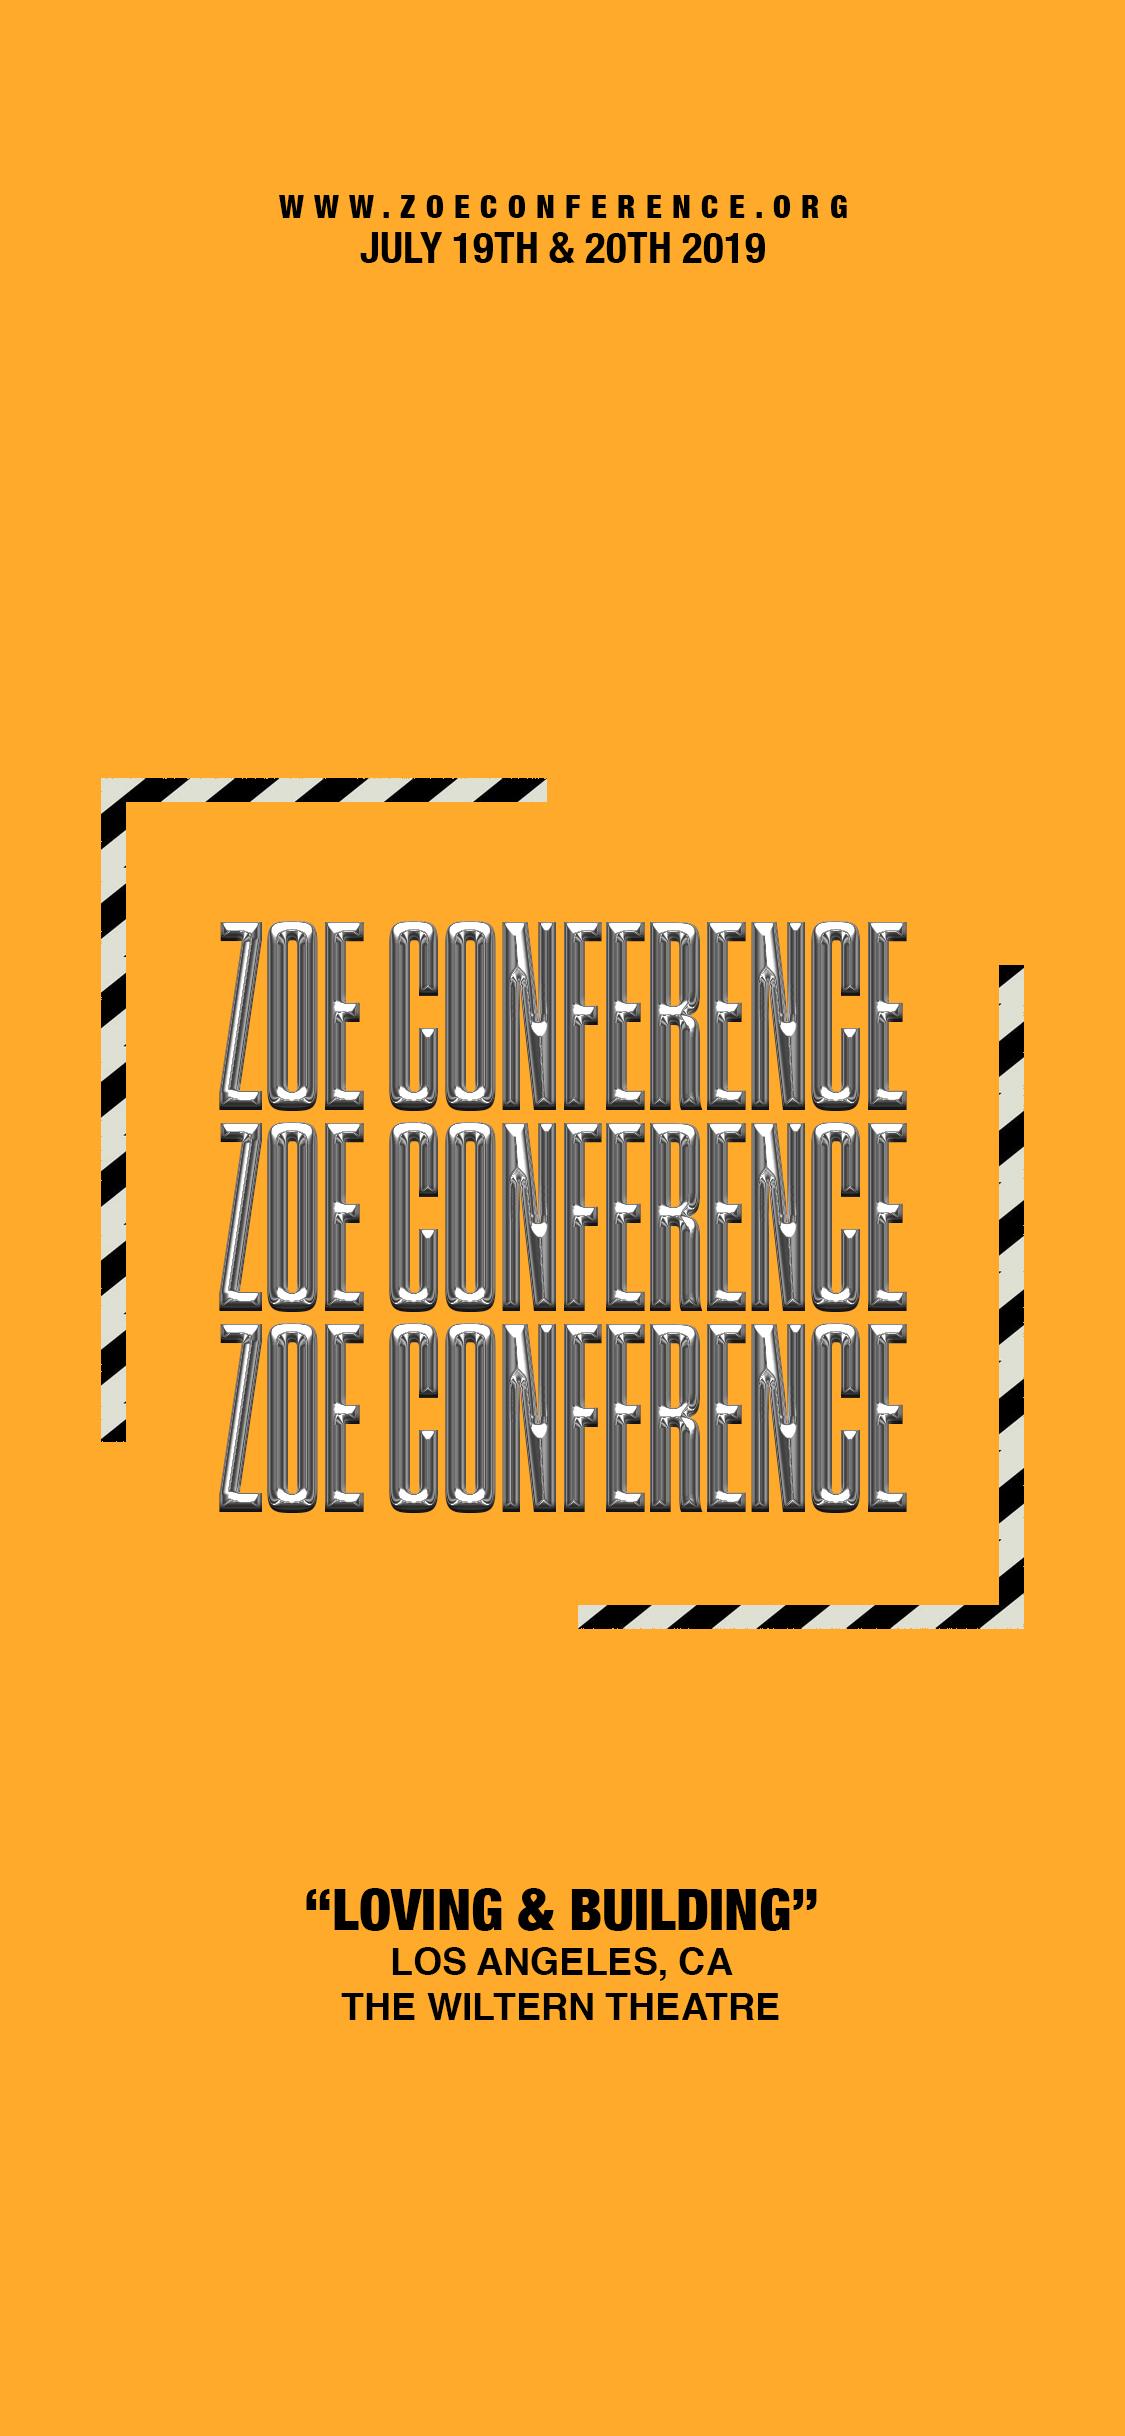 ZOE Conference Wallpaper 2.jpg